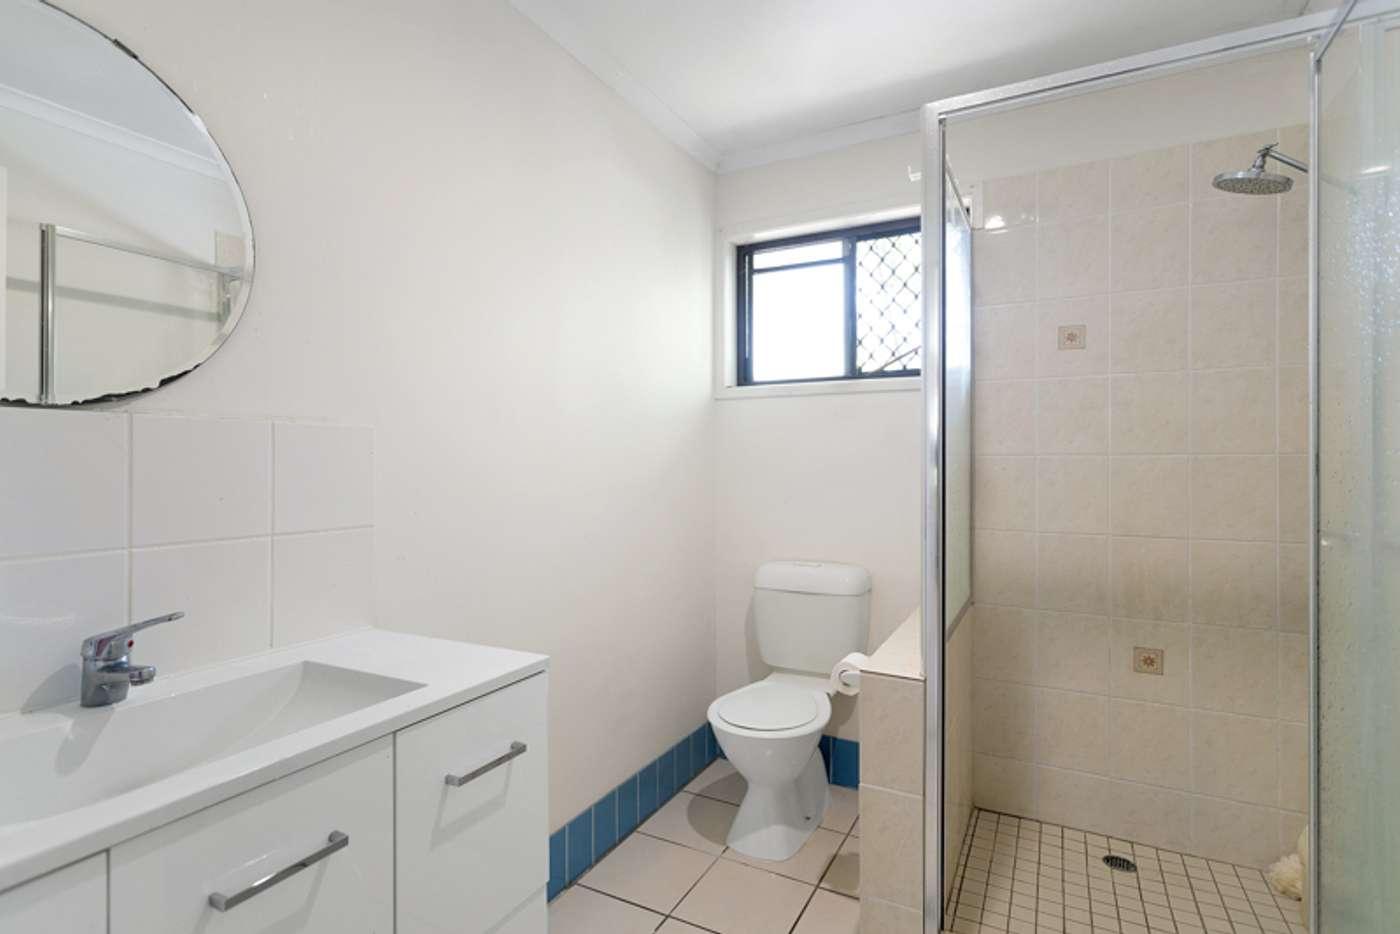 Sixth view of Homely unit listing, 4/25 Byron Street, Mackay QLD 4740